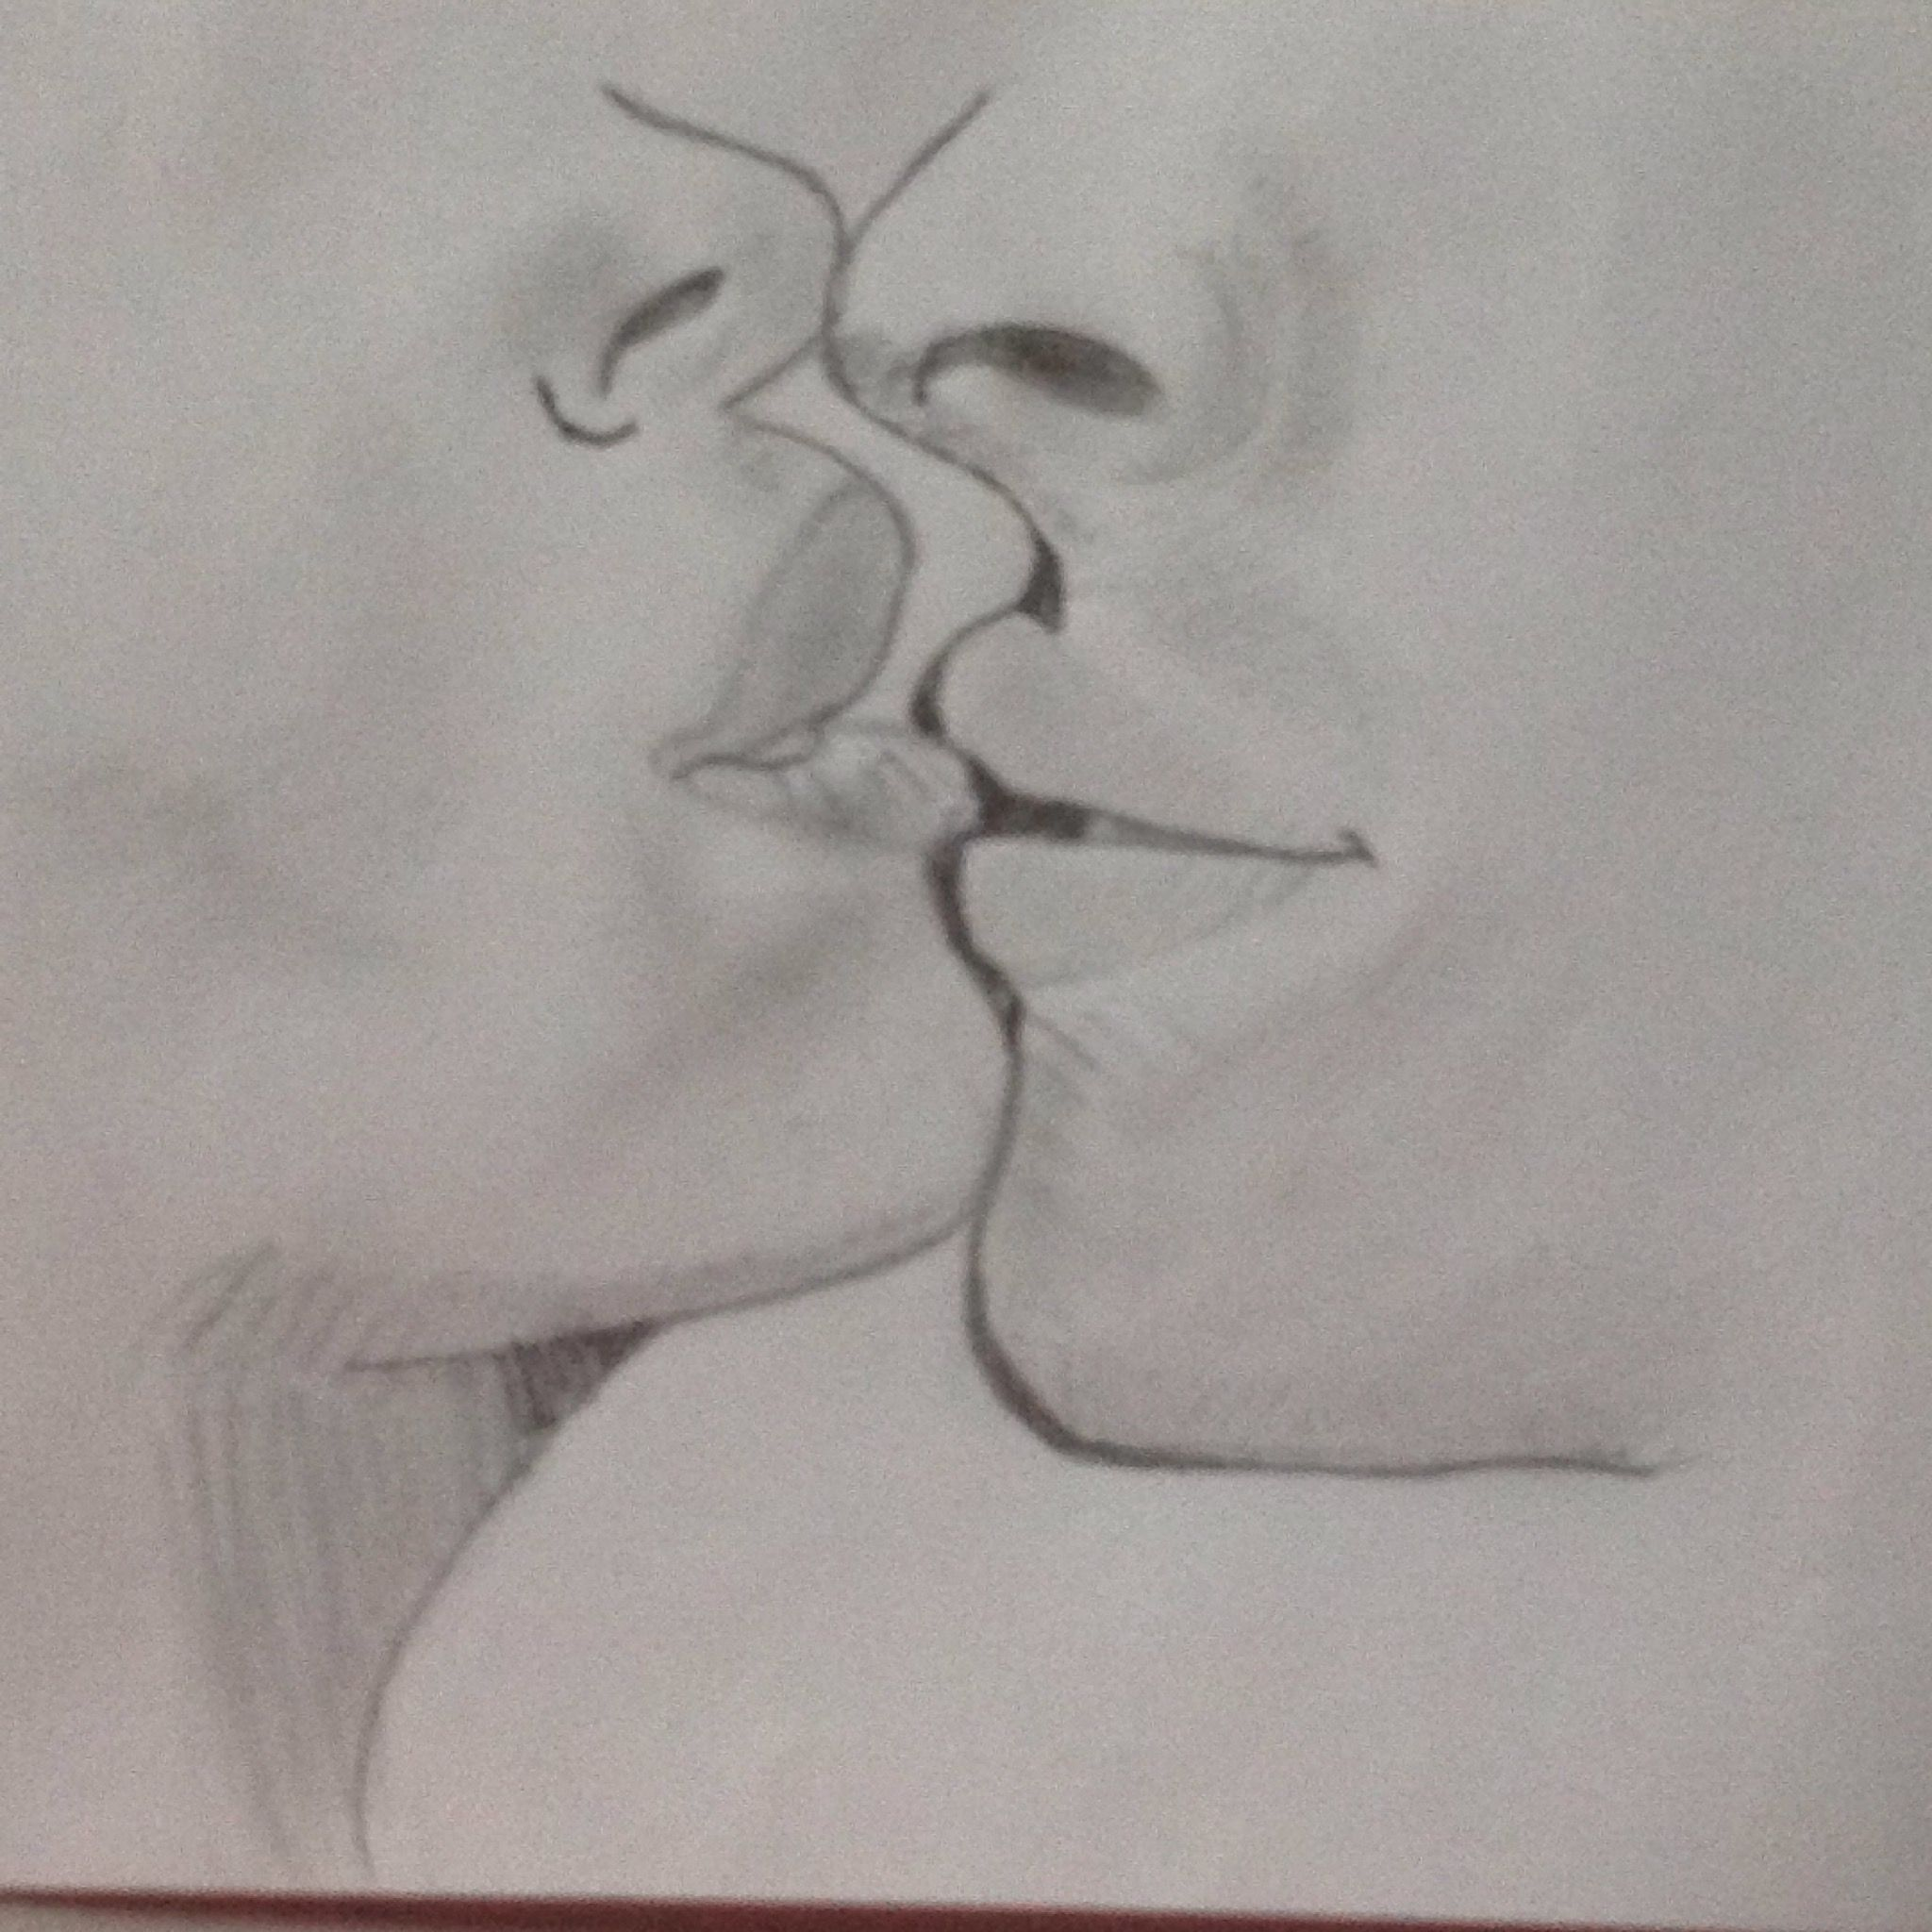 Dibujo Lapiz Beso Amor Besos Amor Dibujos Besos